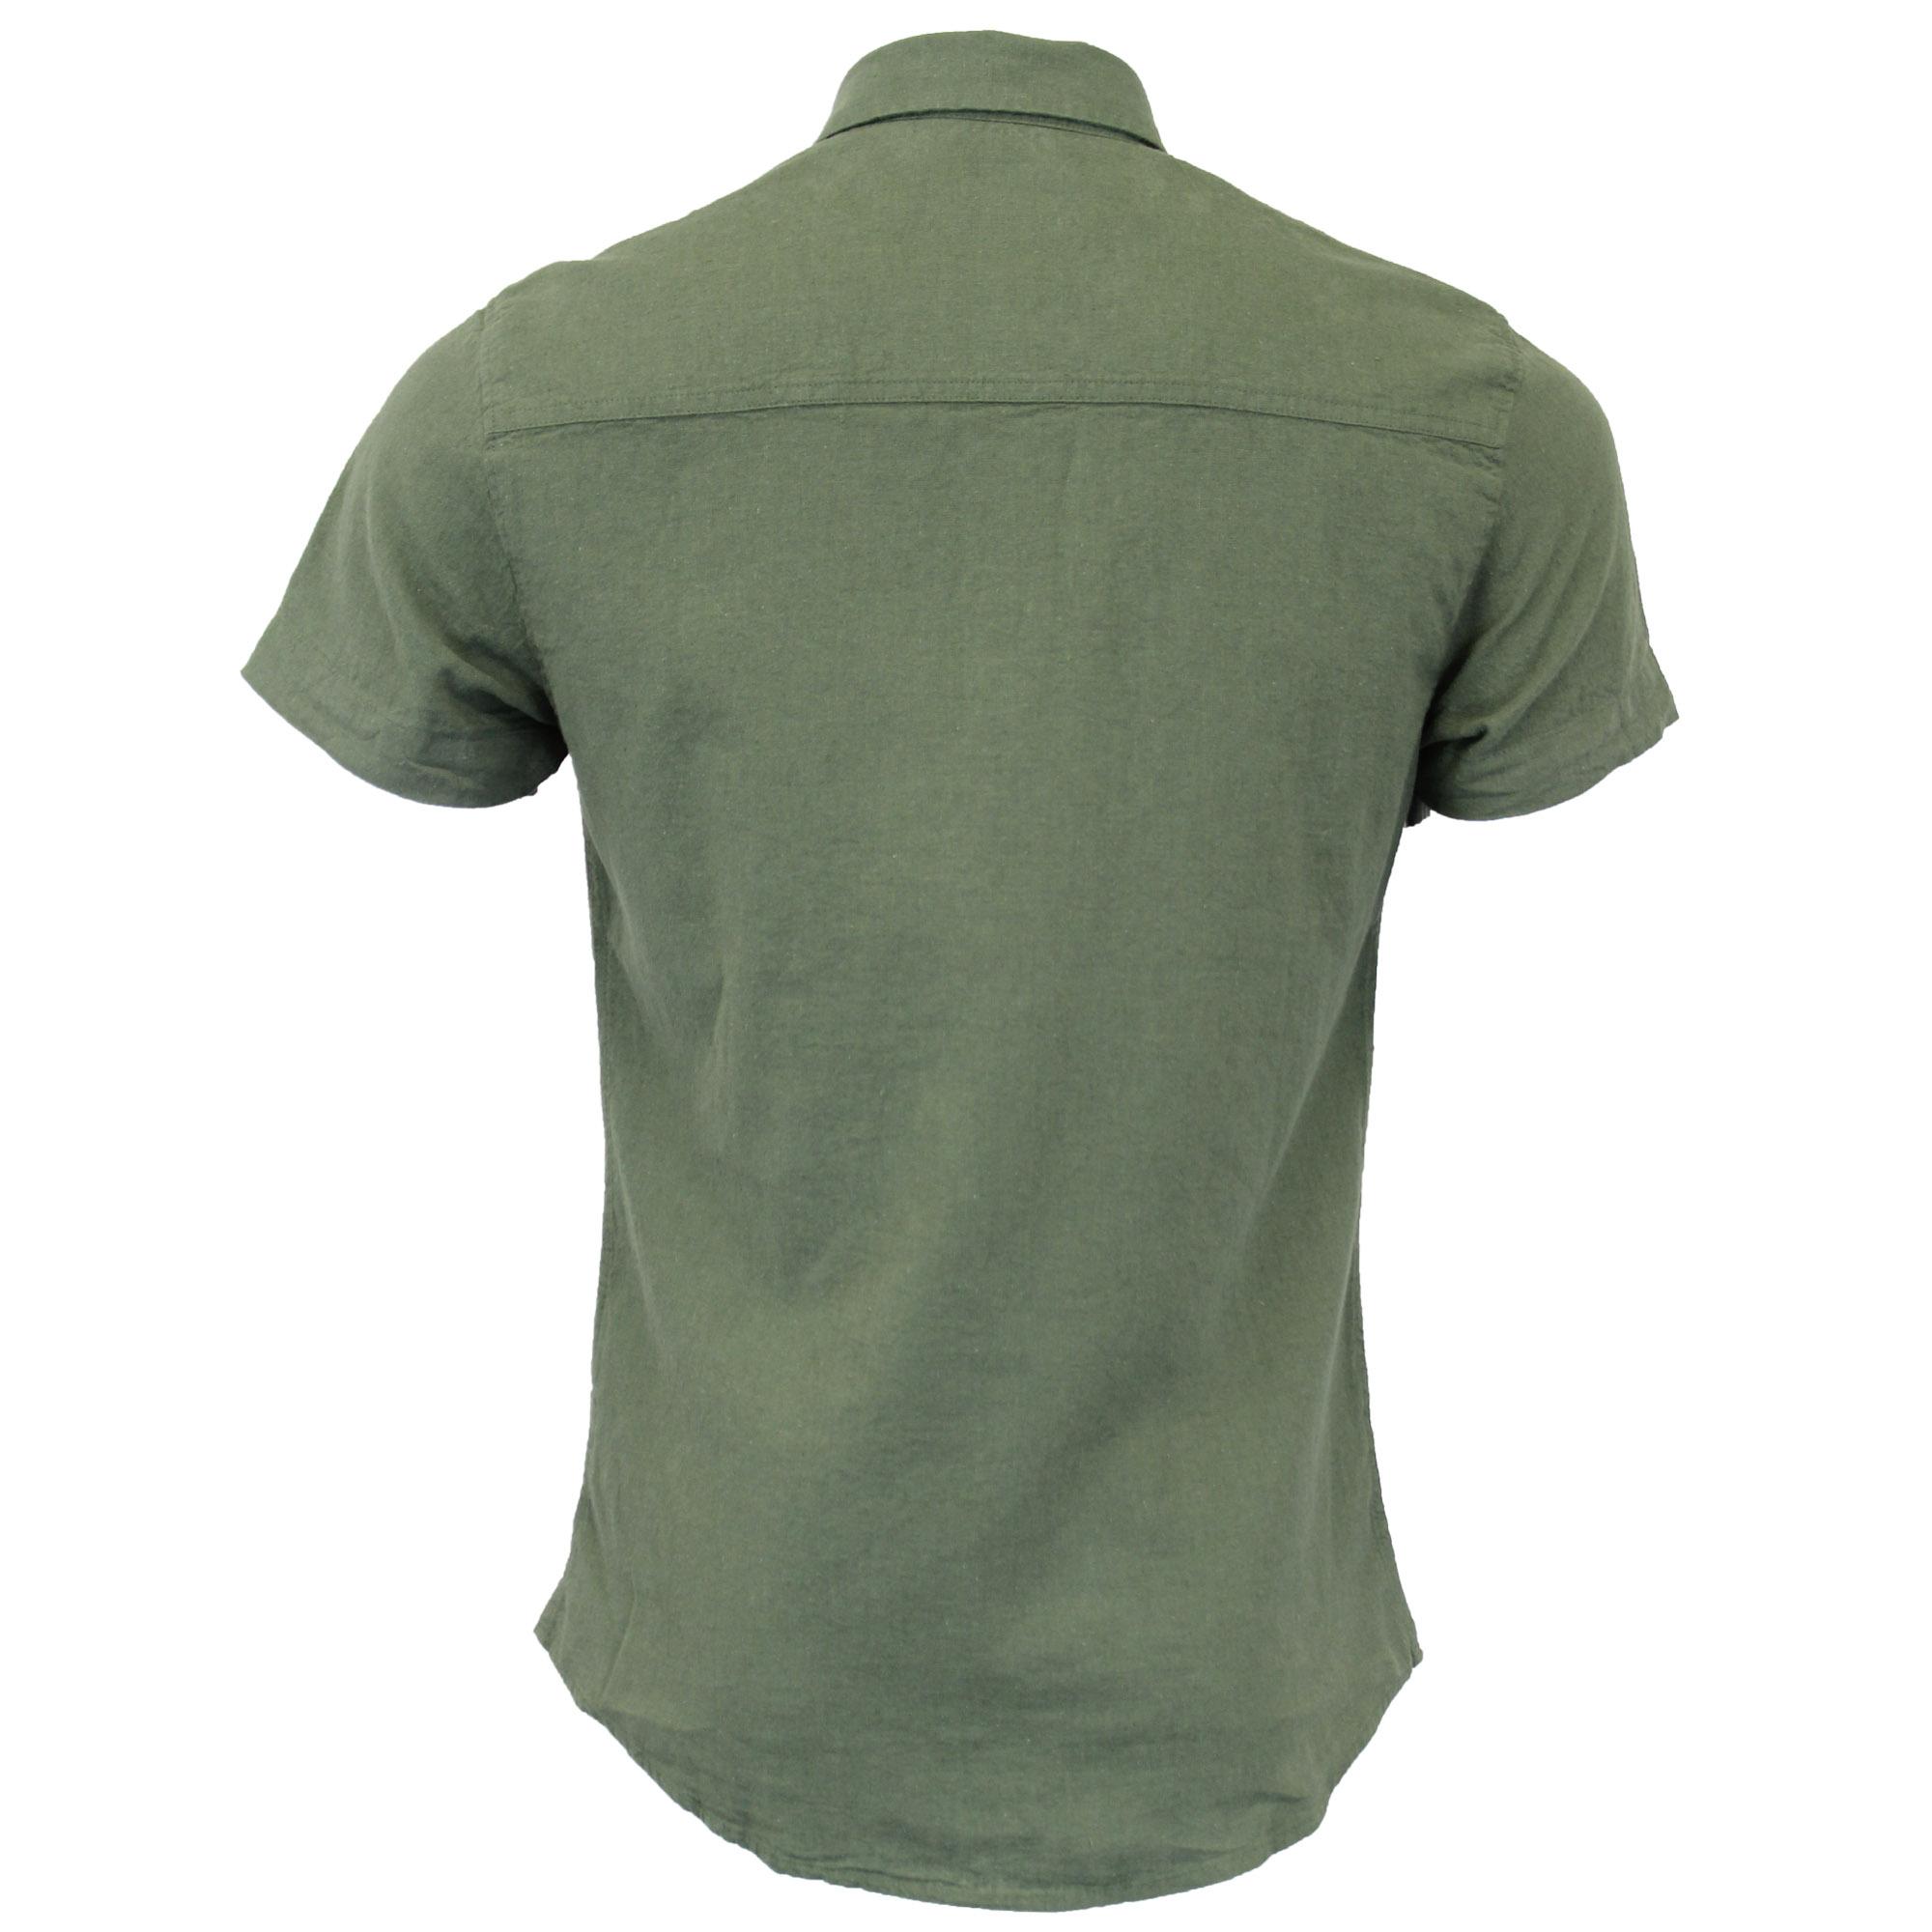 Mens-Linen-Shirt-Threadbare-Short-Sleeved-Brave-Soul-Collared-Casual-Summer-New thumbnail 10